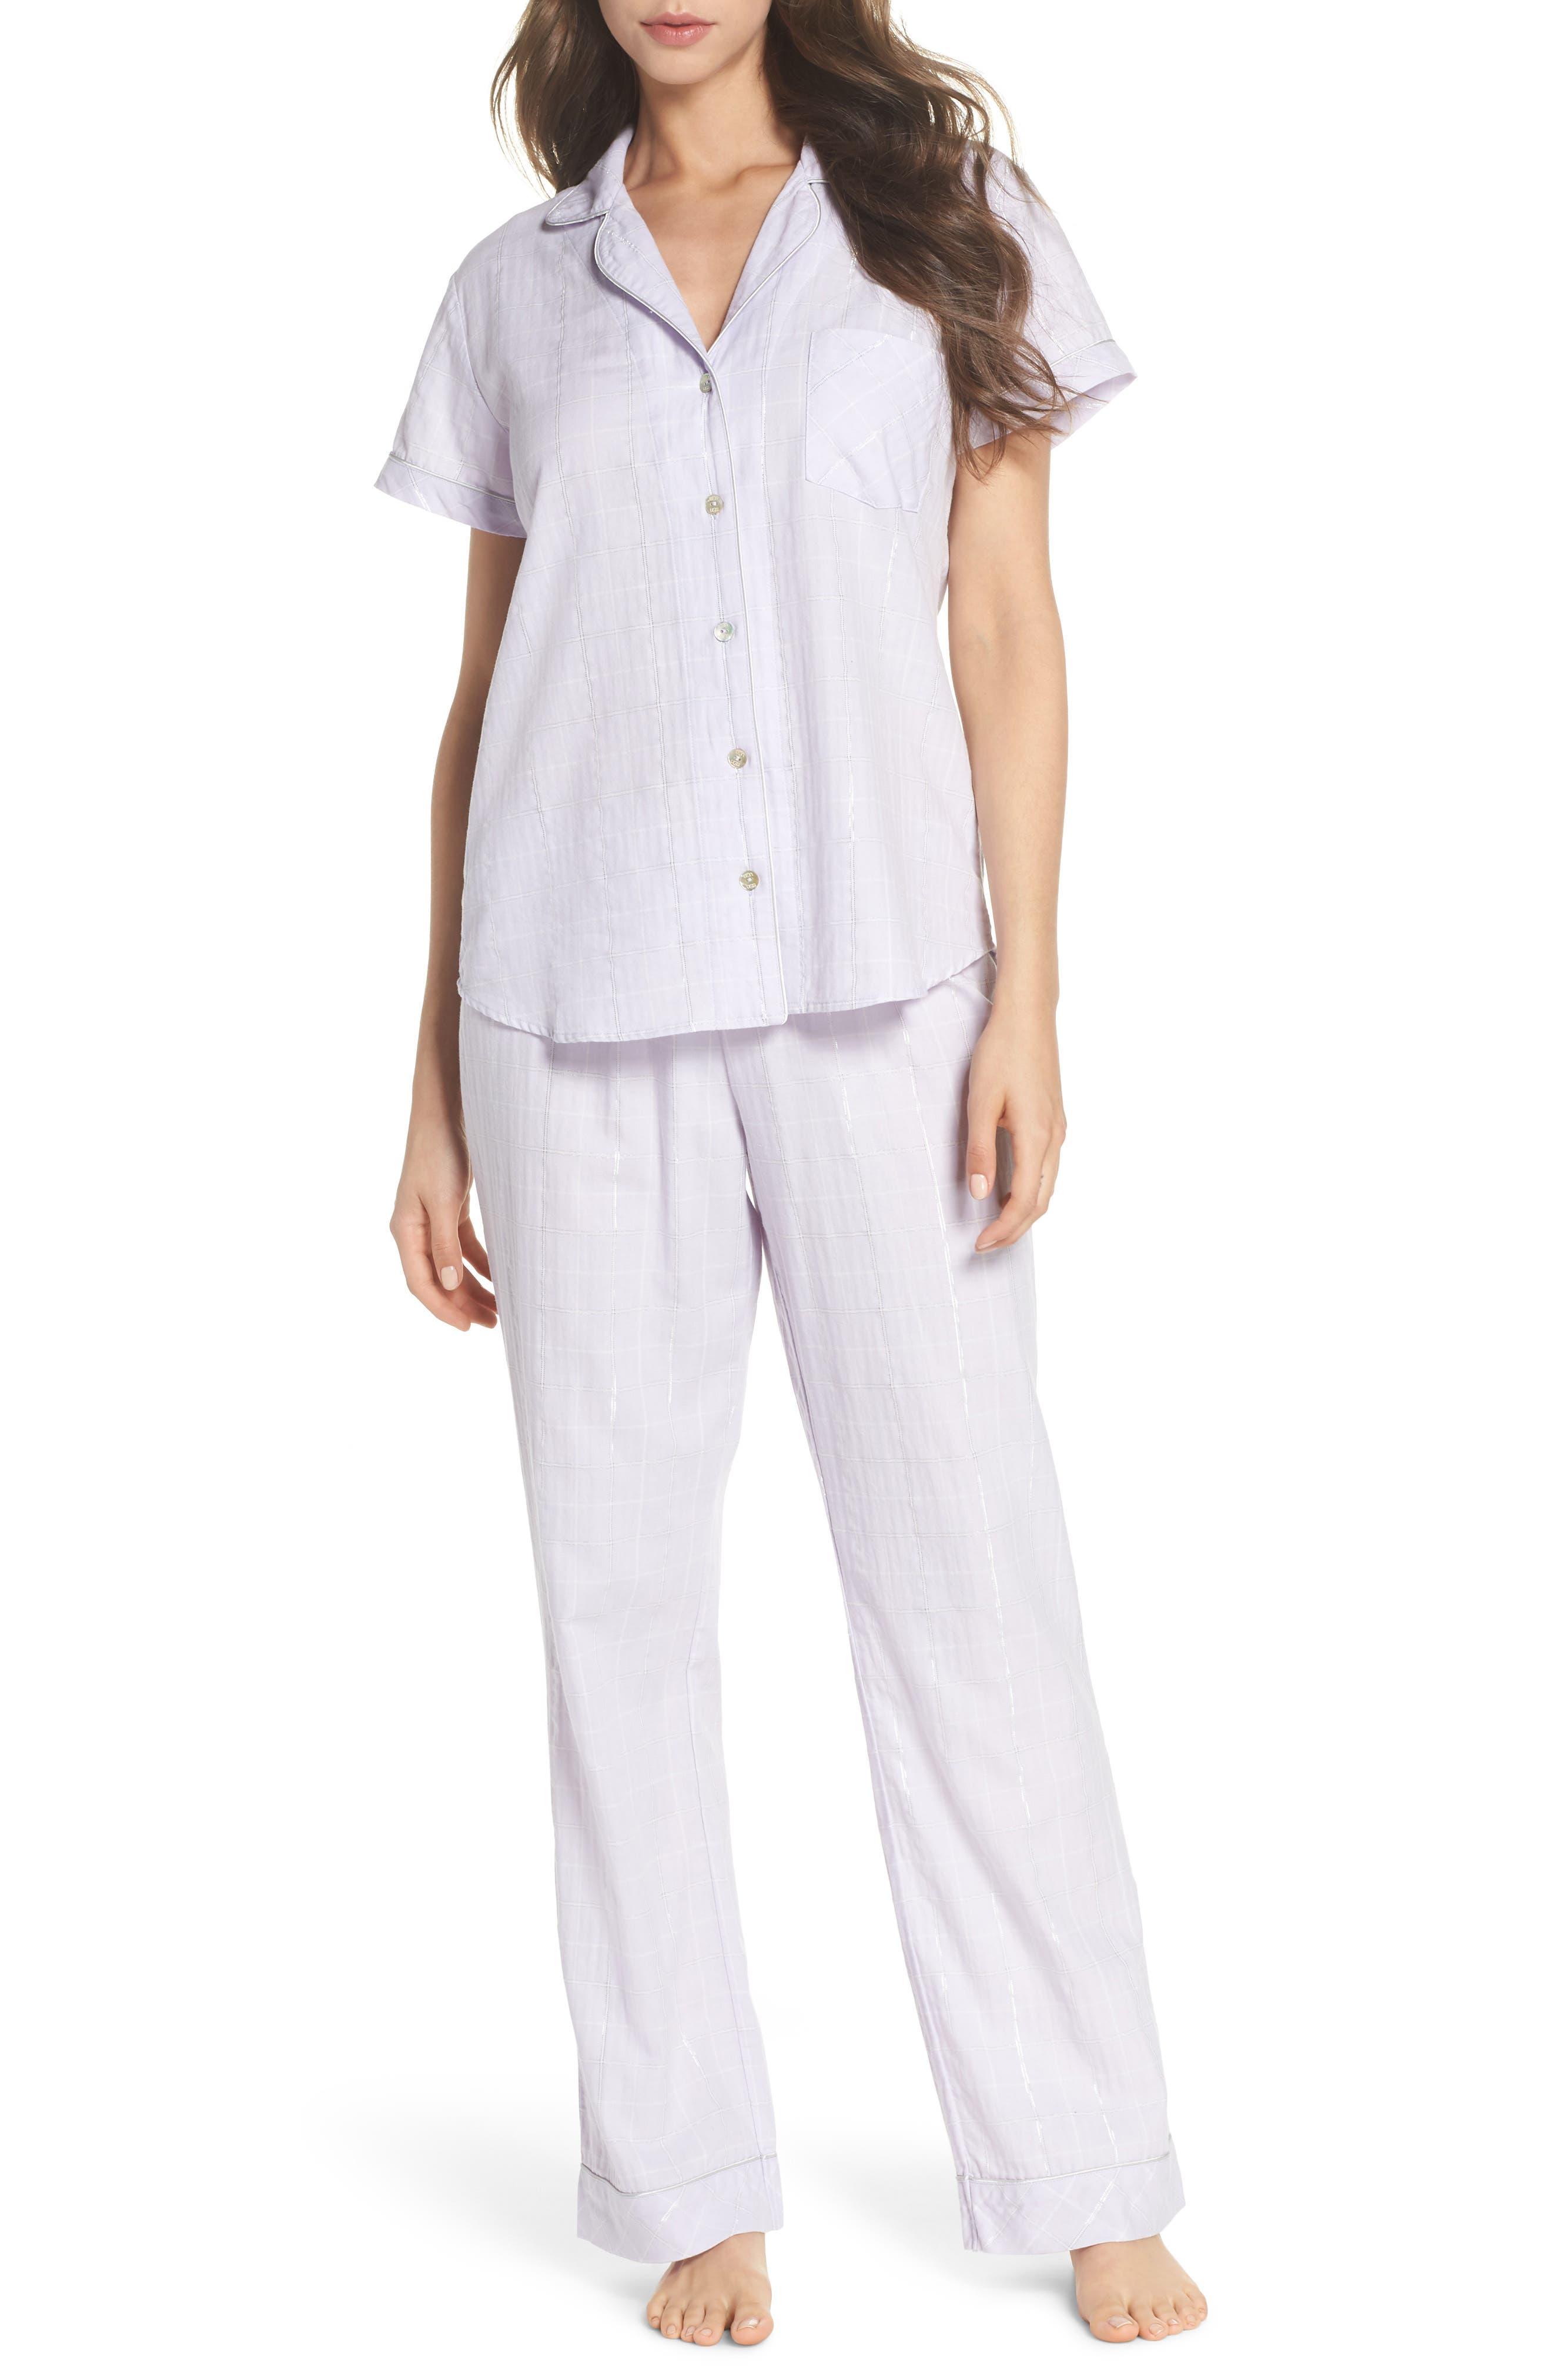 Rosan Sparkle Pajamas,                         Main,                         color, 538